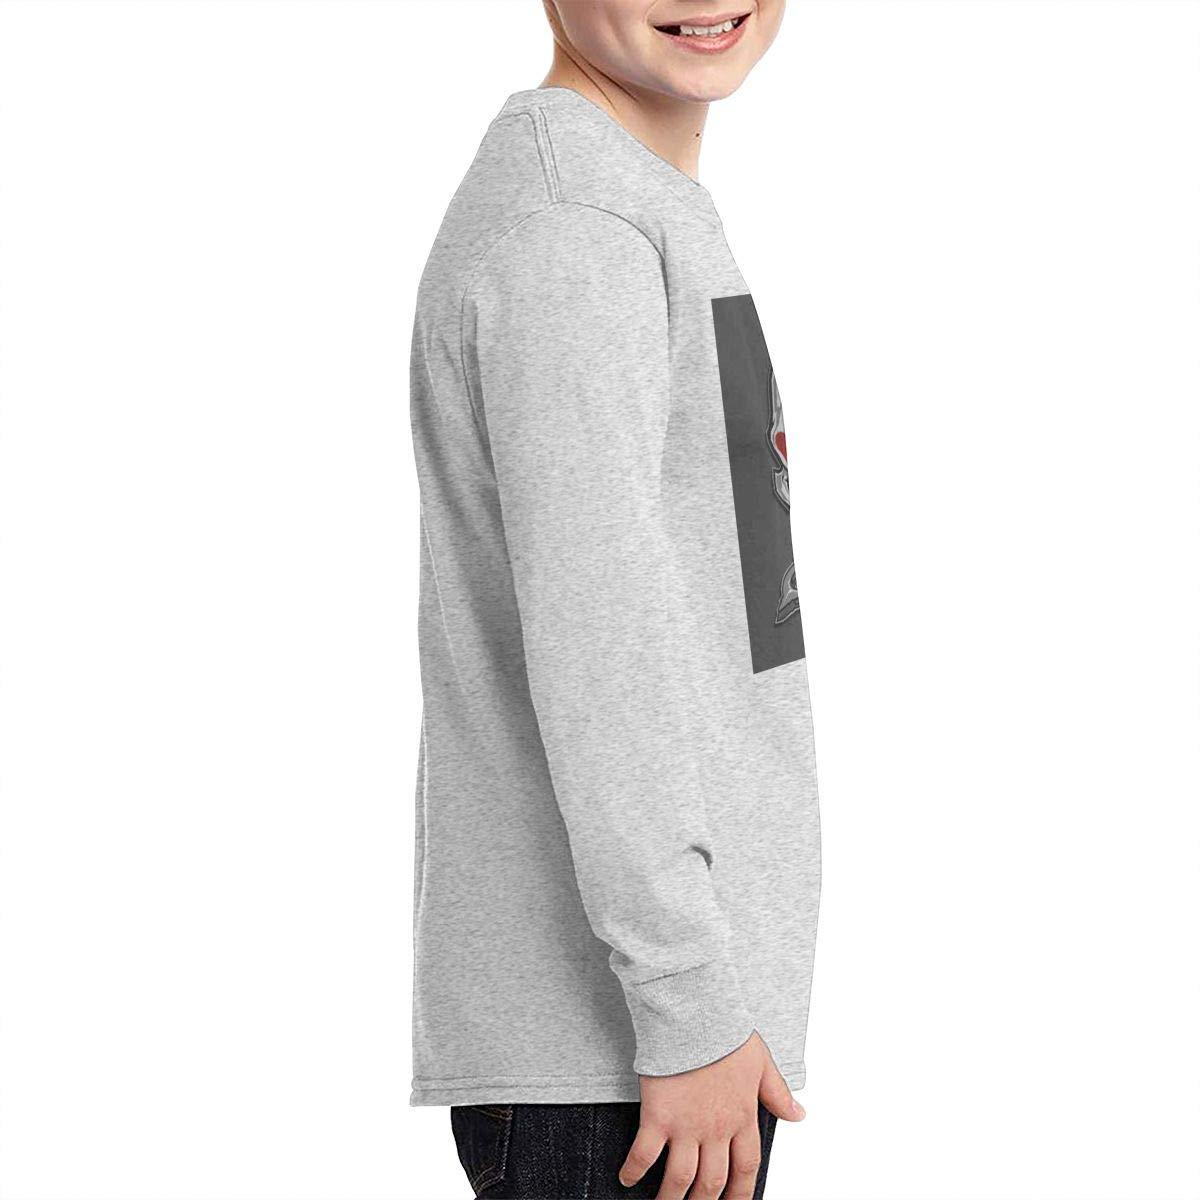 Jmgbsd Boys Five Finger Death Punch Outdoor Round Neck T-Shirt Black